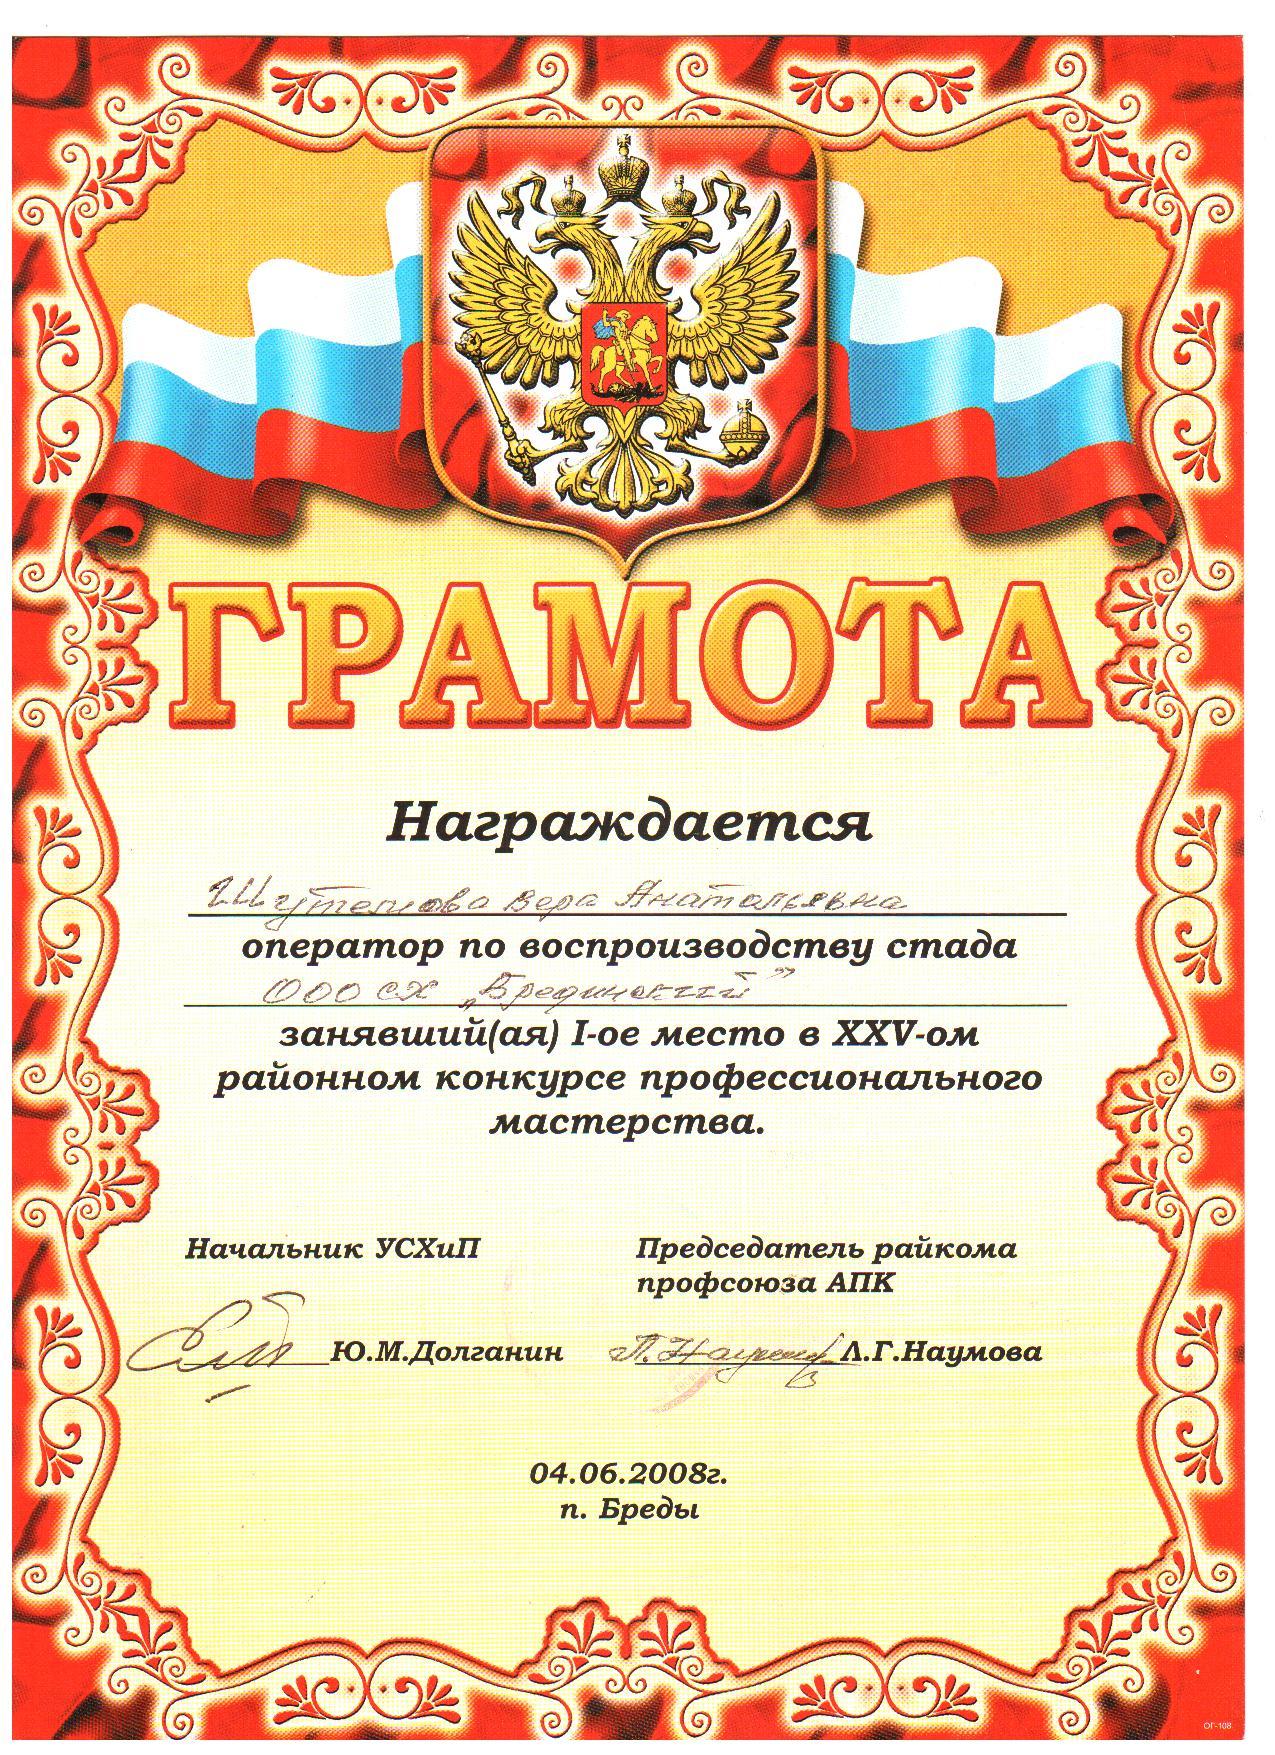 C:\Documents and Settings\Администратор\Рабочий стол\Шутёмова приложение\Изображение 008.jpg